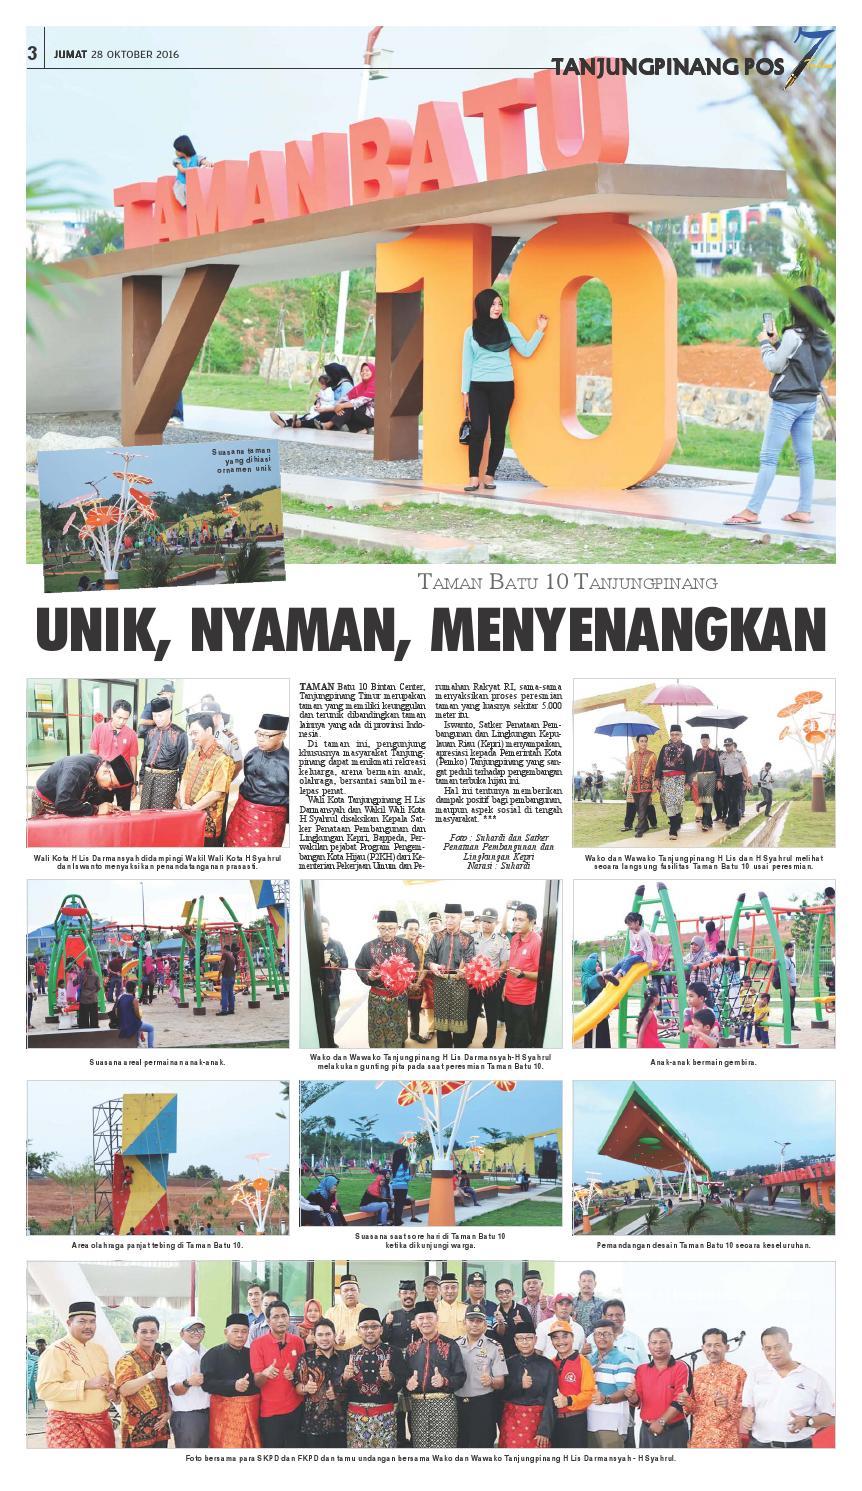 Tanjungpinang Pos 28 Oktober 2016 Tanjungpinangpos Issuu Taman Batu 10